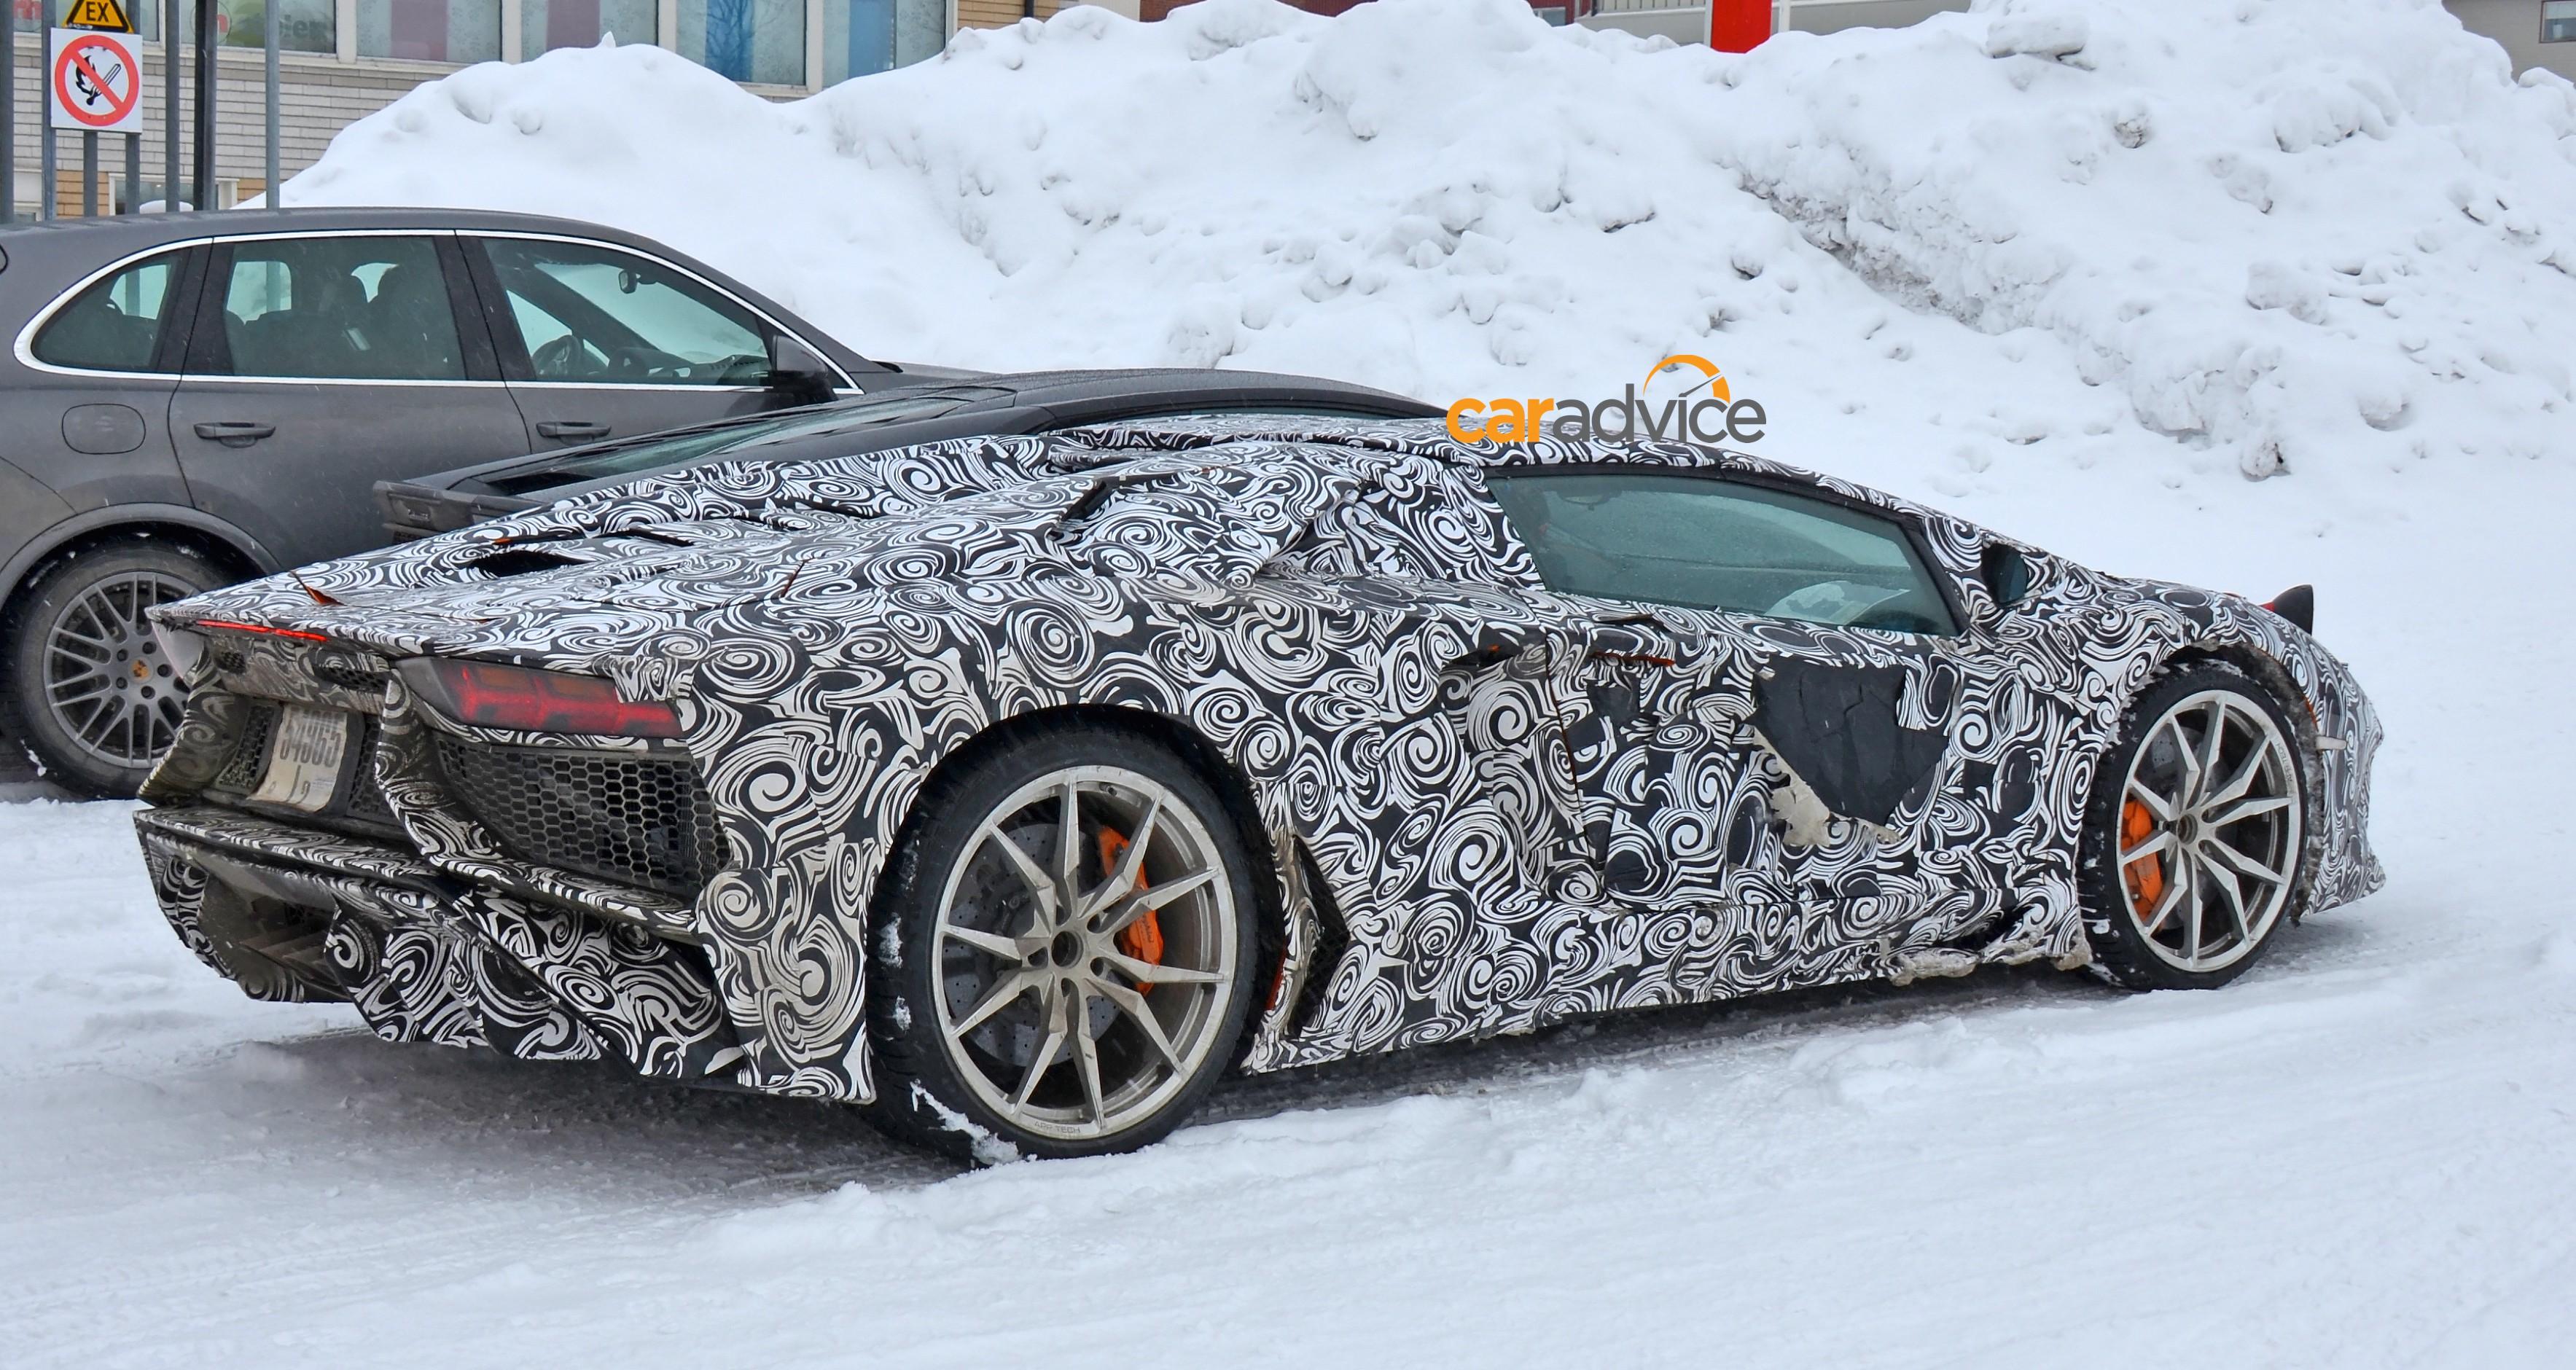 Lamborghini Aventador Sv Roadster Spotted Cold Weather